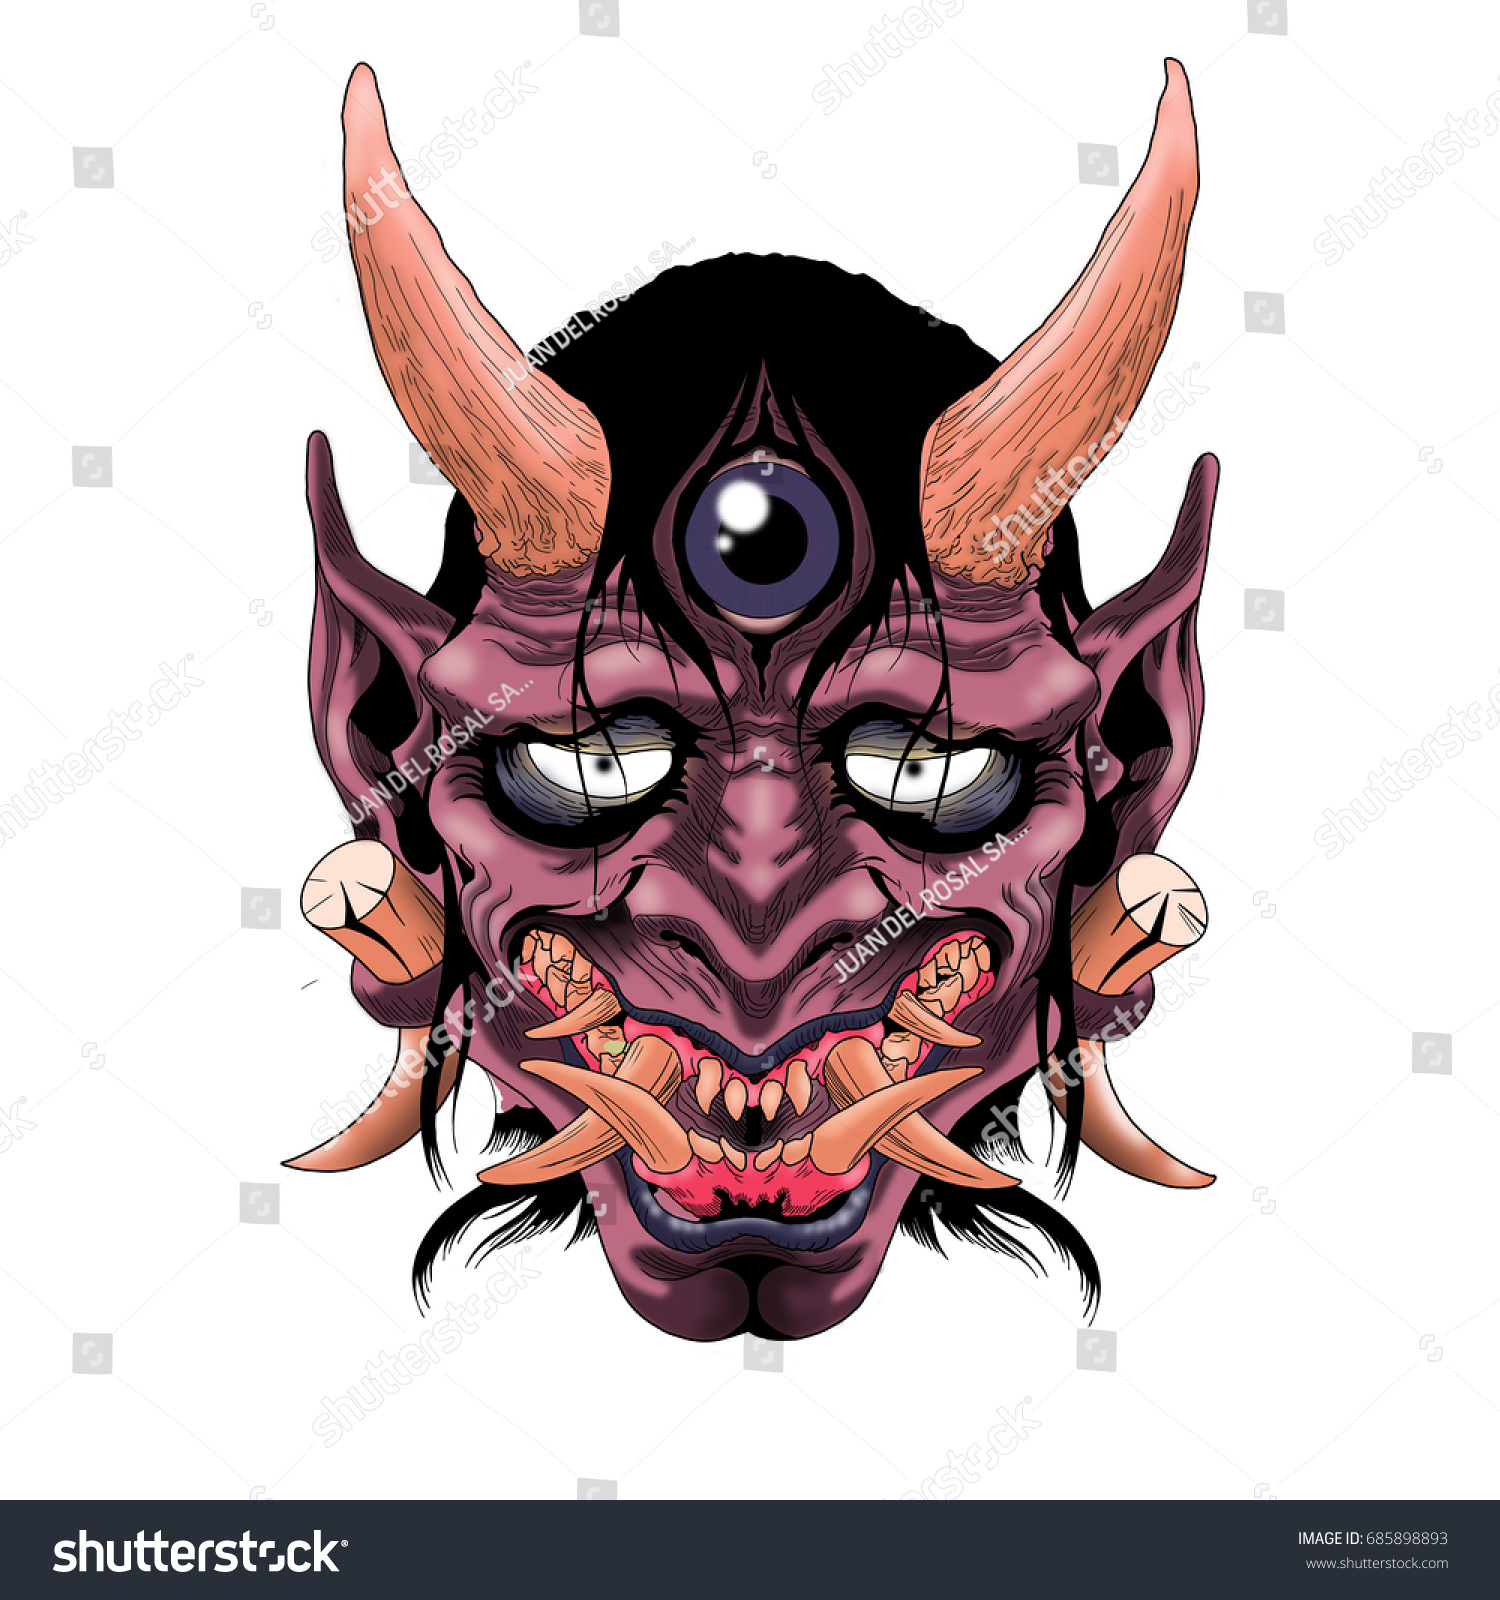 Japanese Demon_Tattoo design by blacksilence92 on DeviantArt |Demon Japanese Traditional Designs